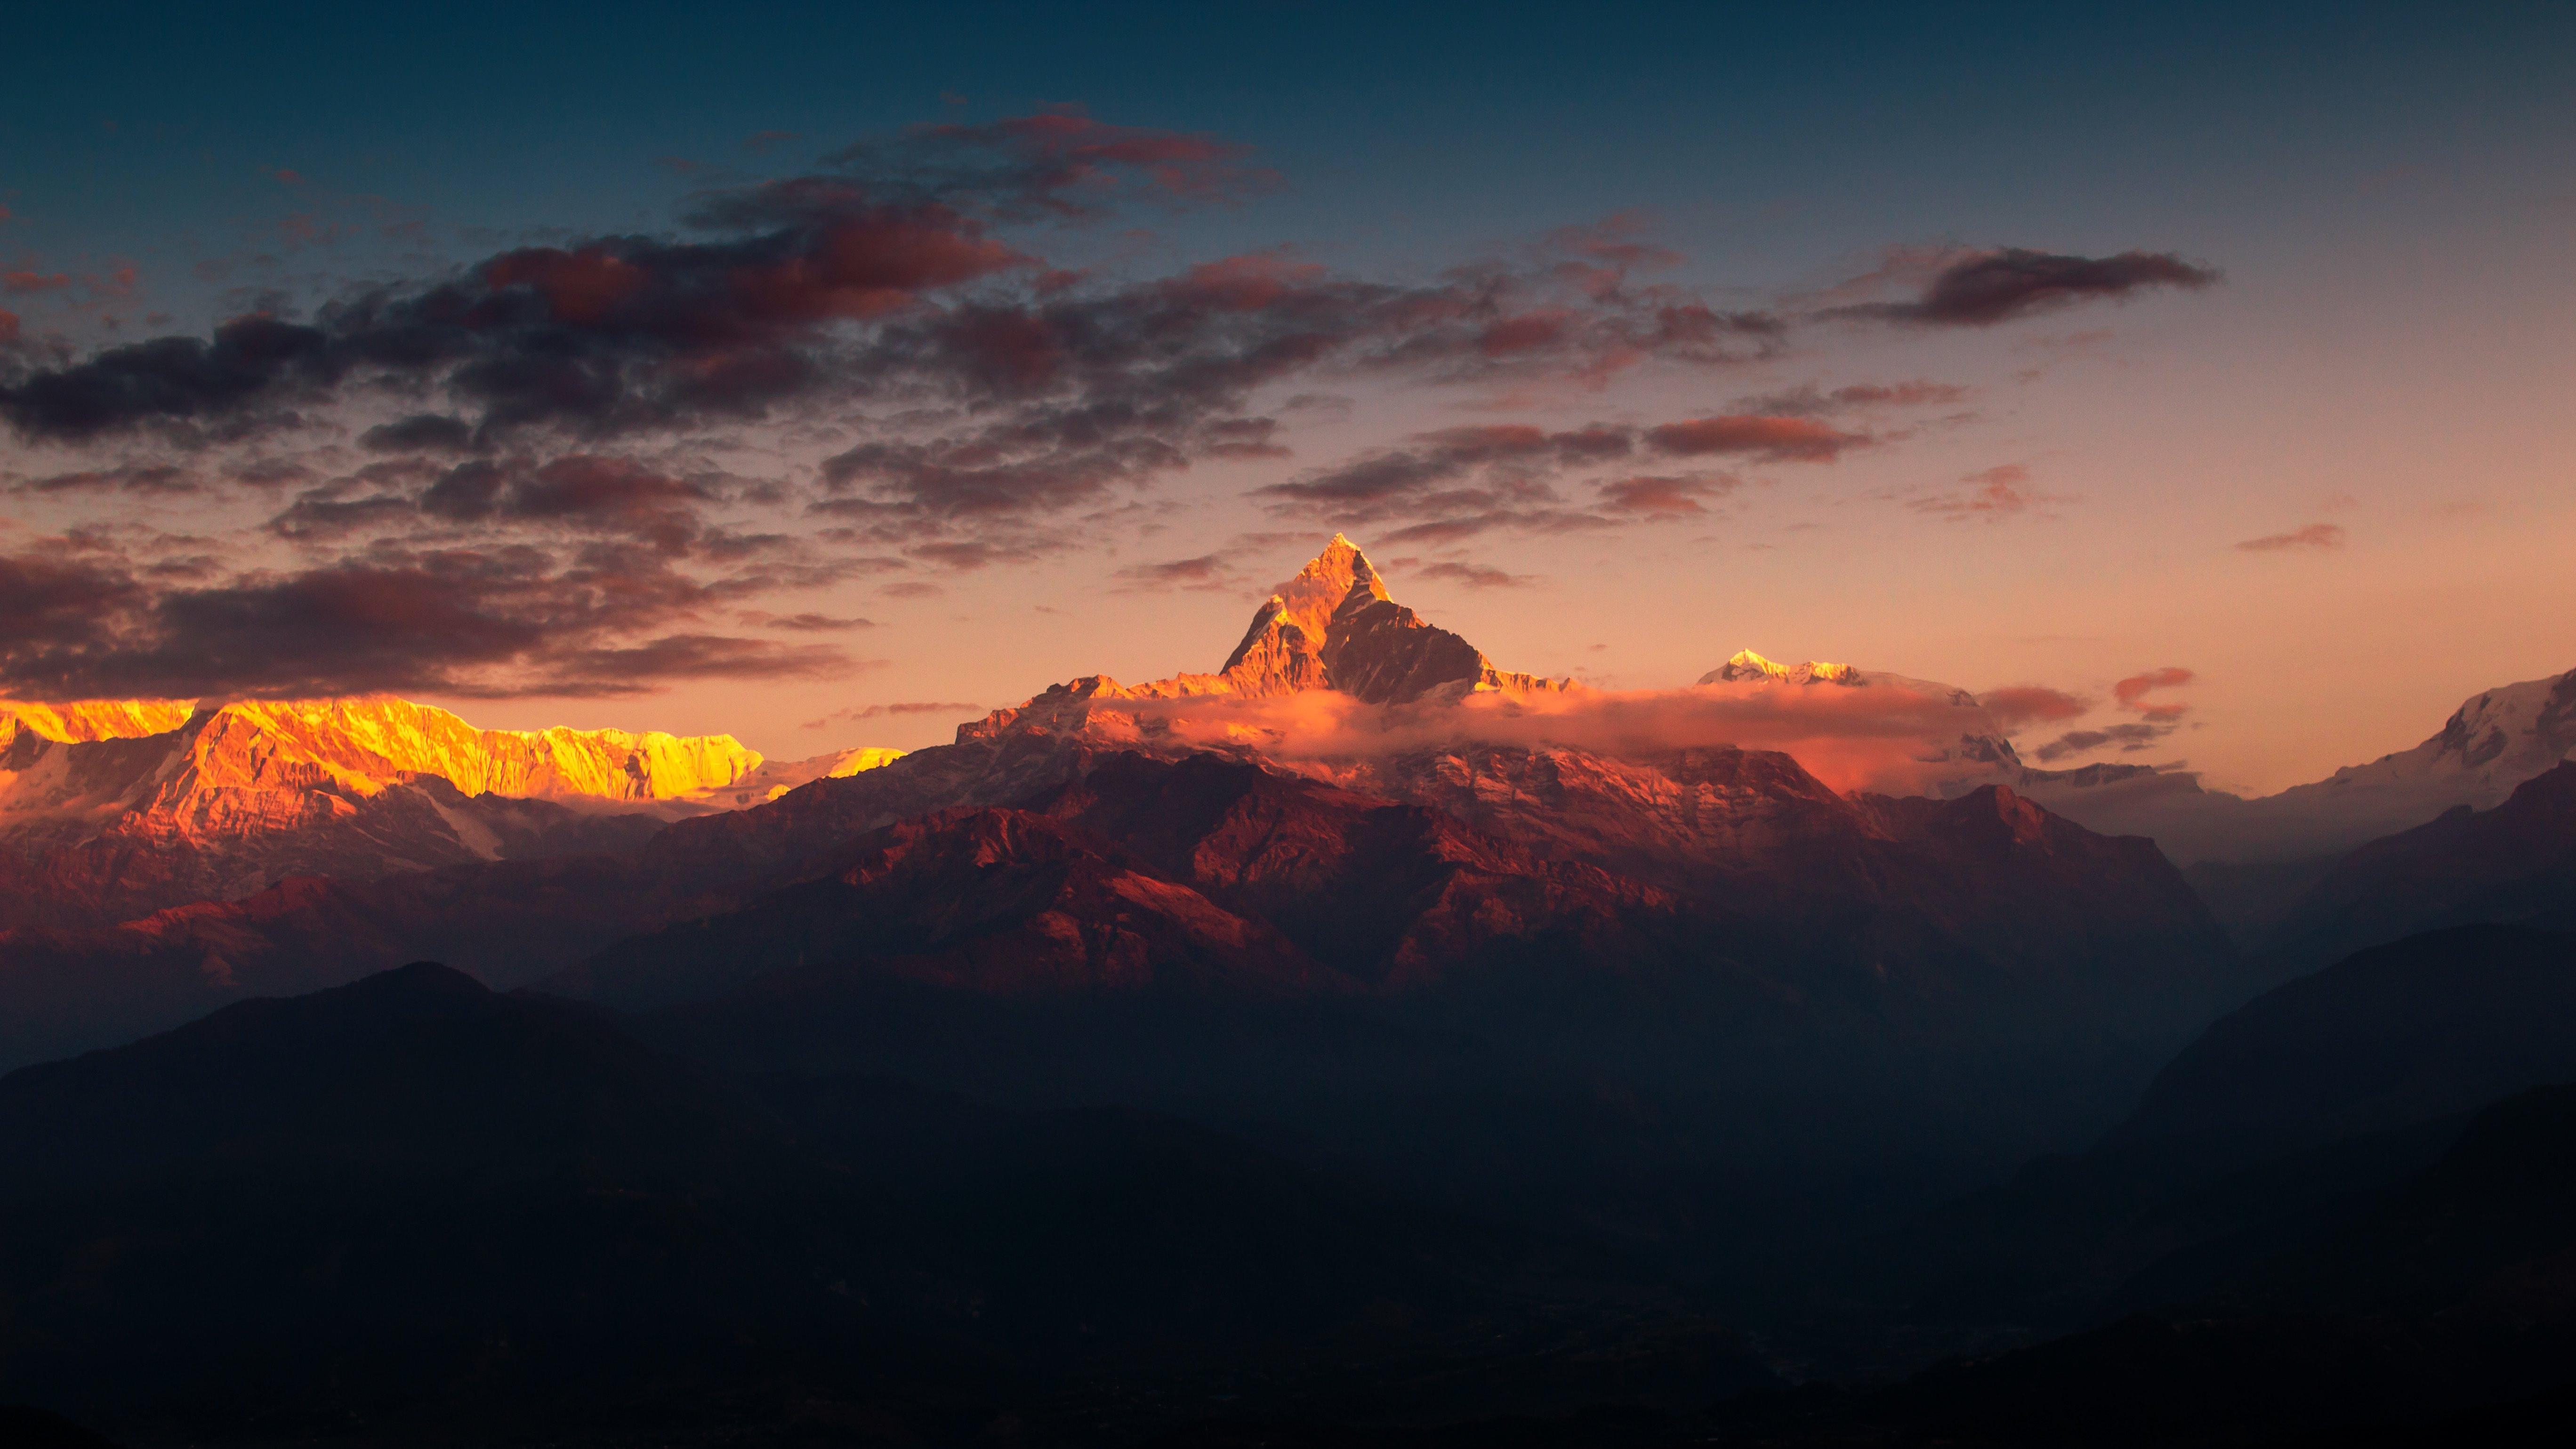 Himalayas 5k hd nature 4k wallpapers images - Himalaya pictures wallpaper ...